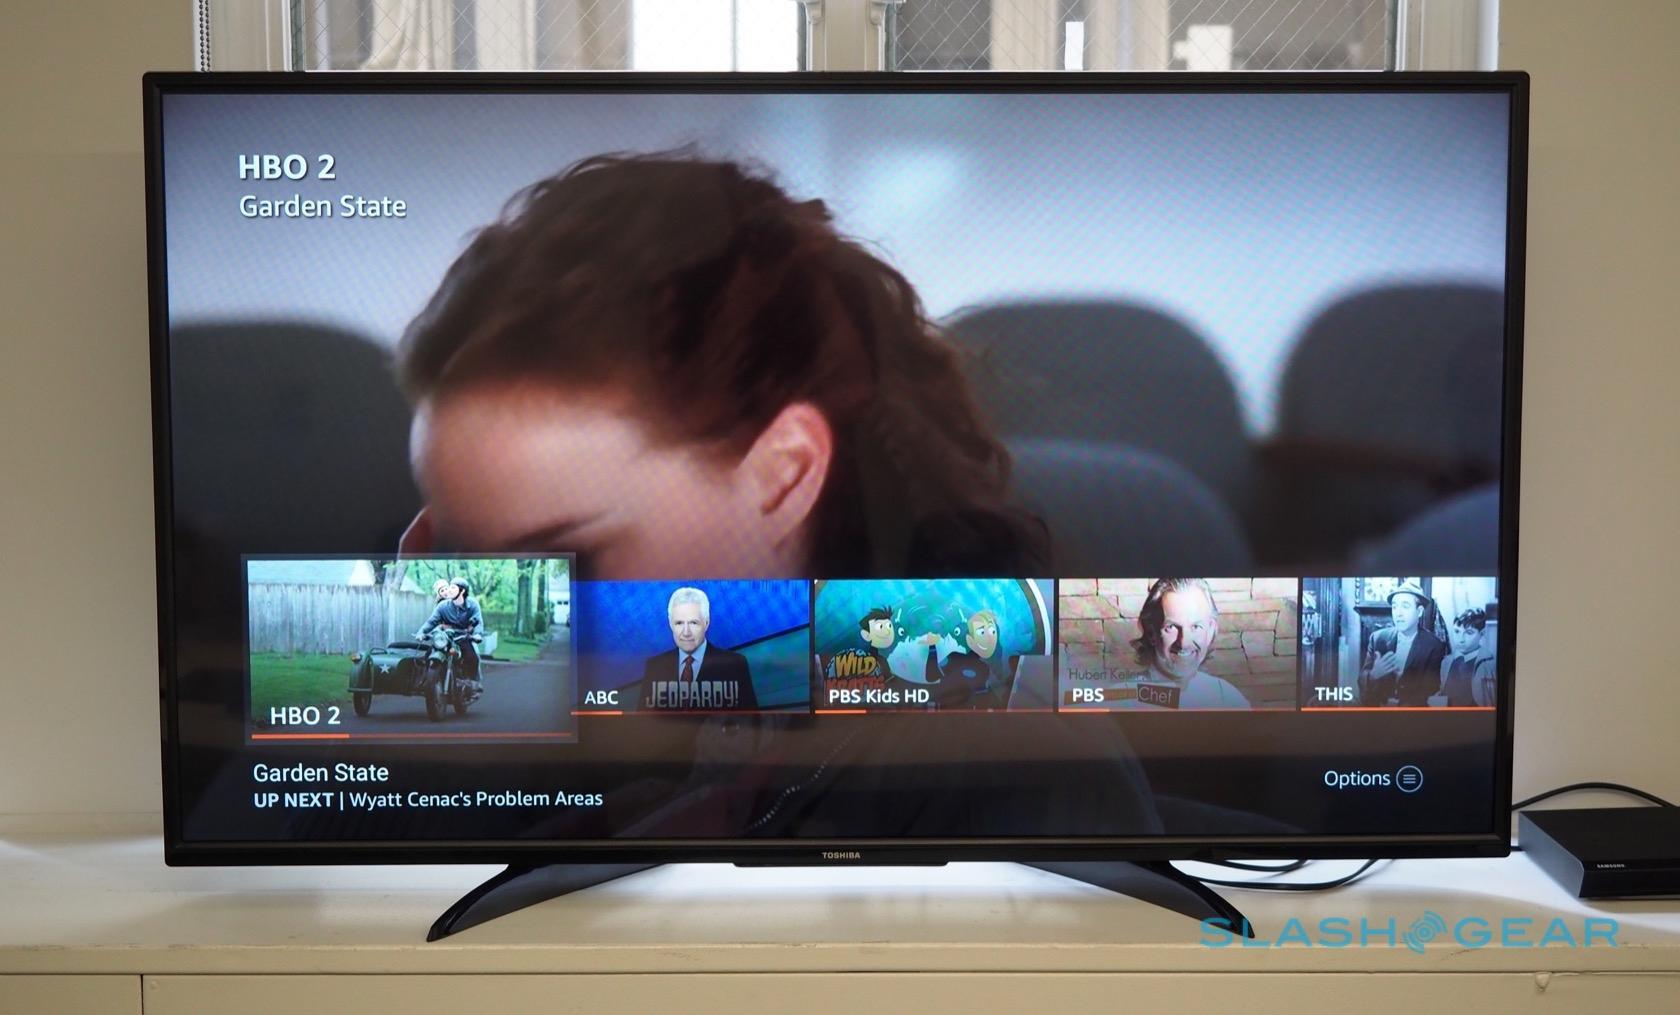 Toshiba's Fire TV Edition hands on: Alexa-smart TV ships